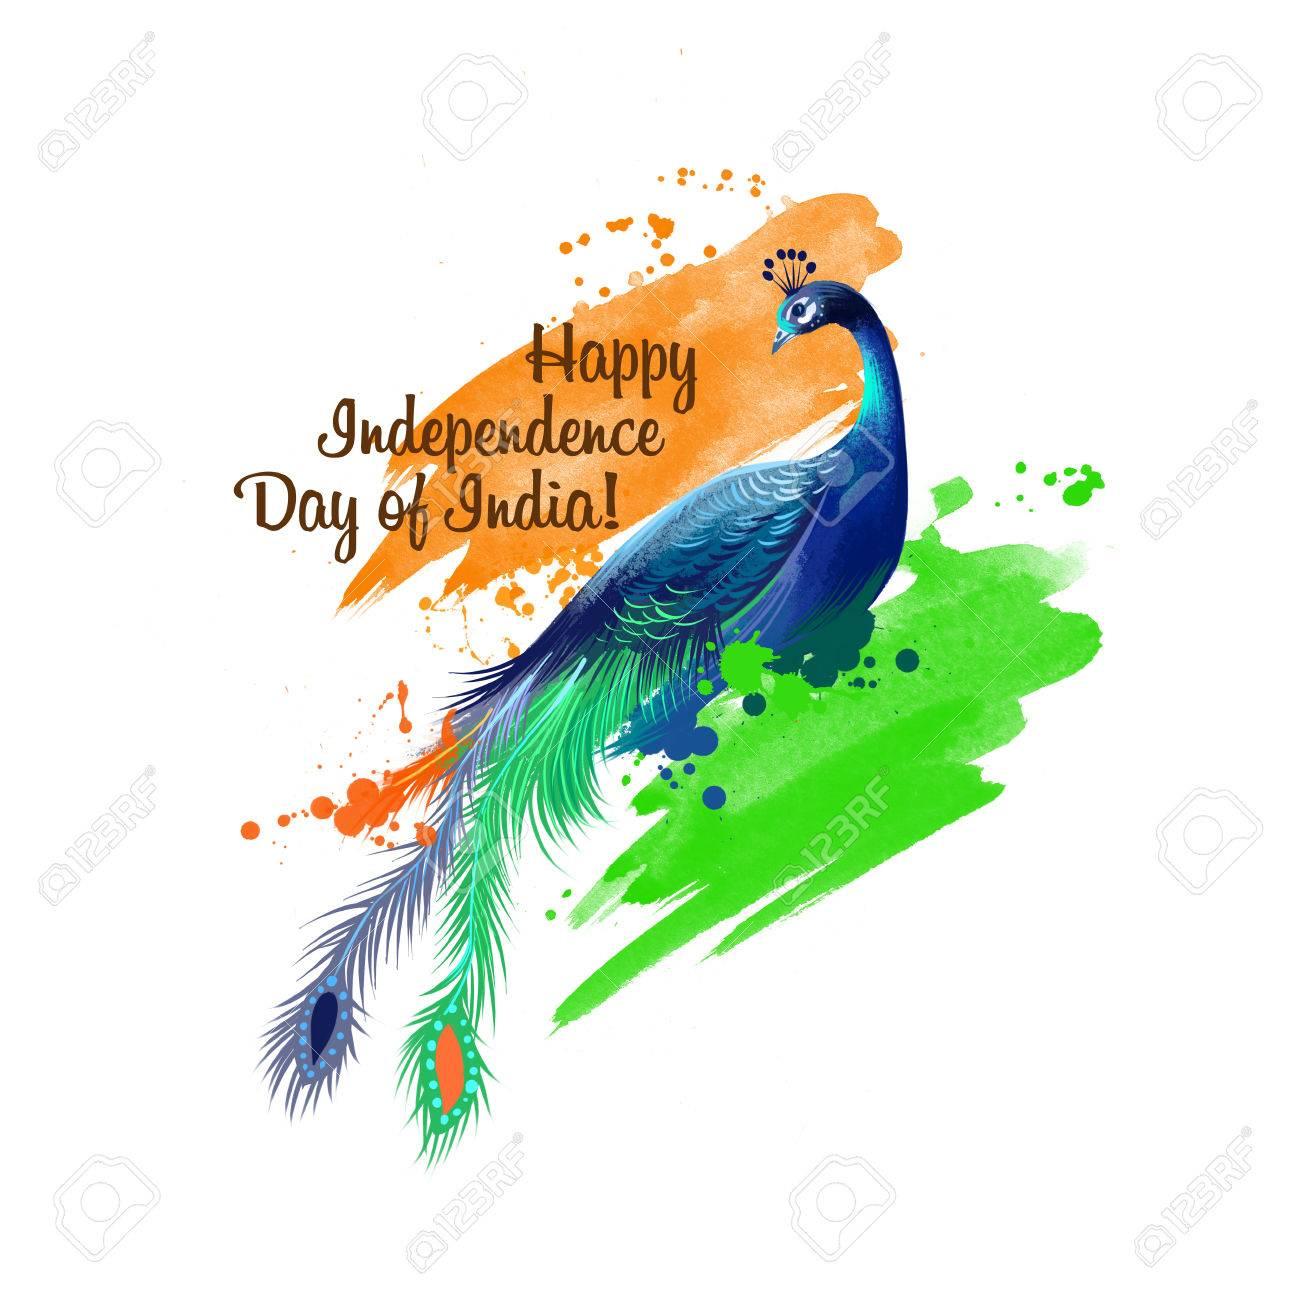 Independence Day Of India Digital Art Illustration National Stock